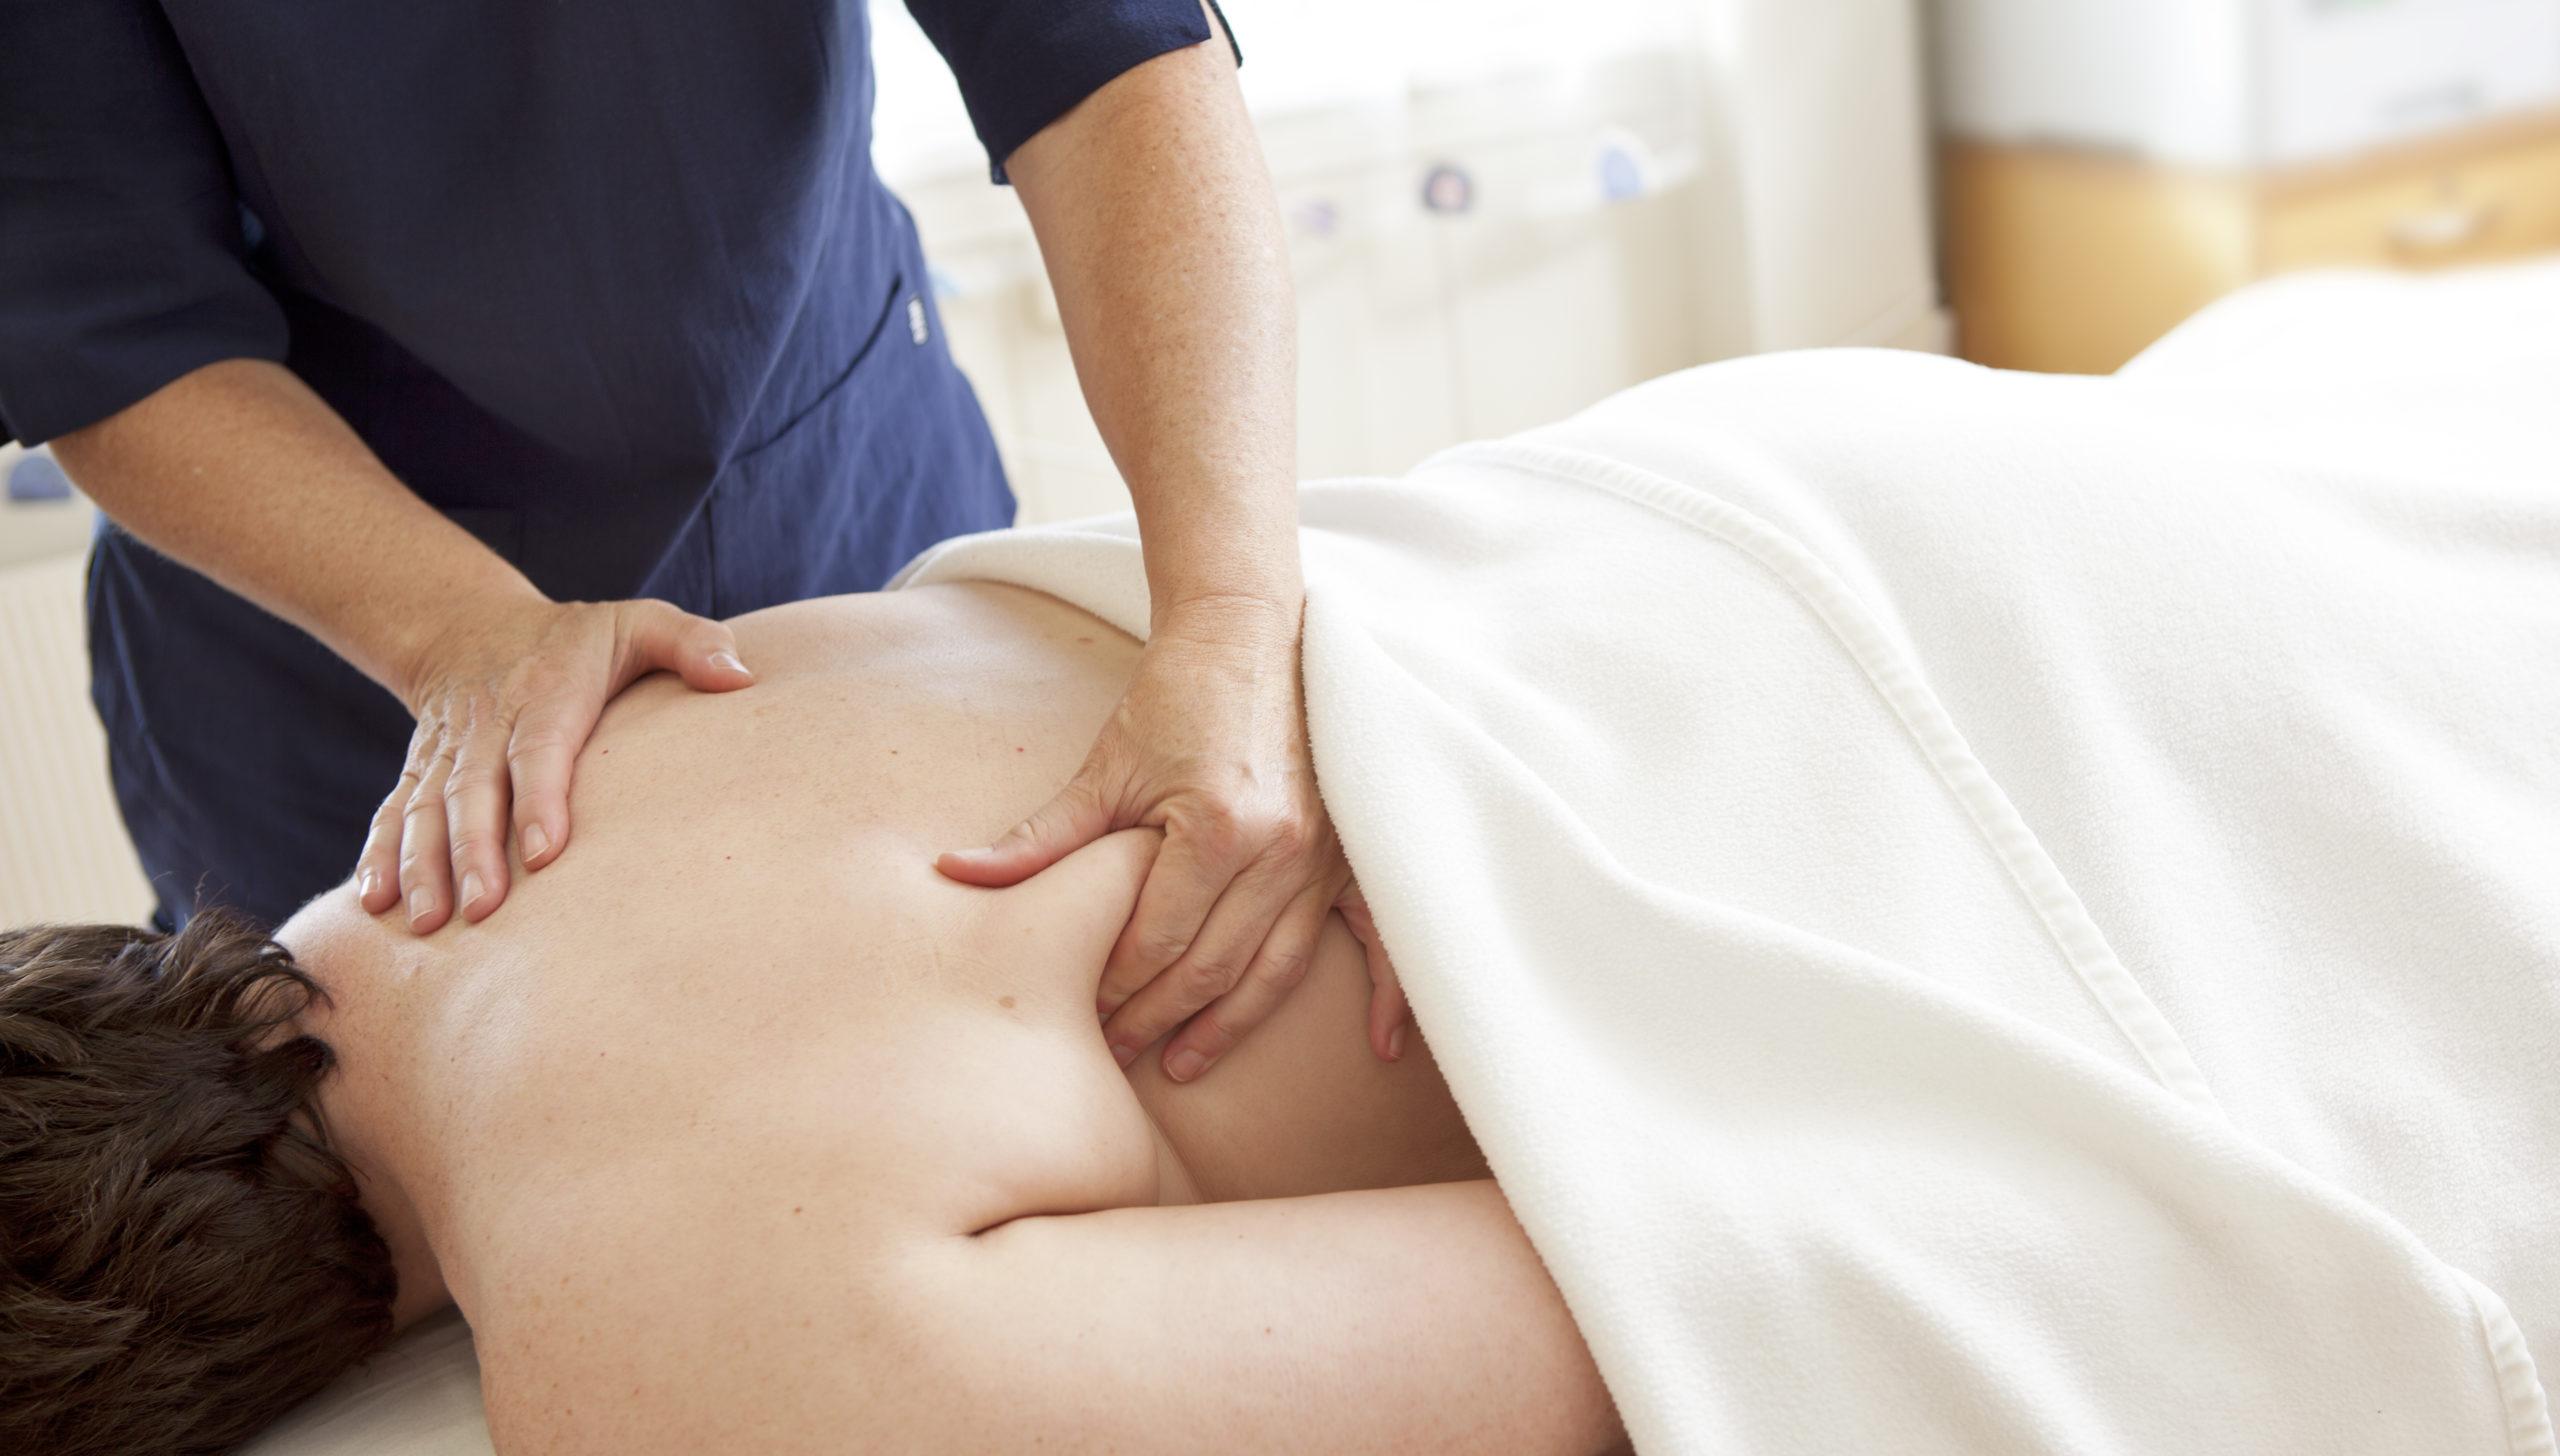 Psykomotorisk fysioterapeut Kia masserer en pasient under Psykomotorisk fysioterapi, Snøhetta Terapi